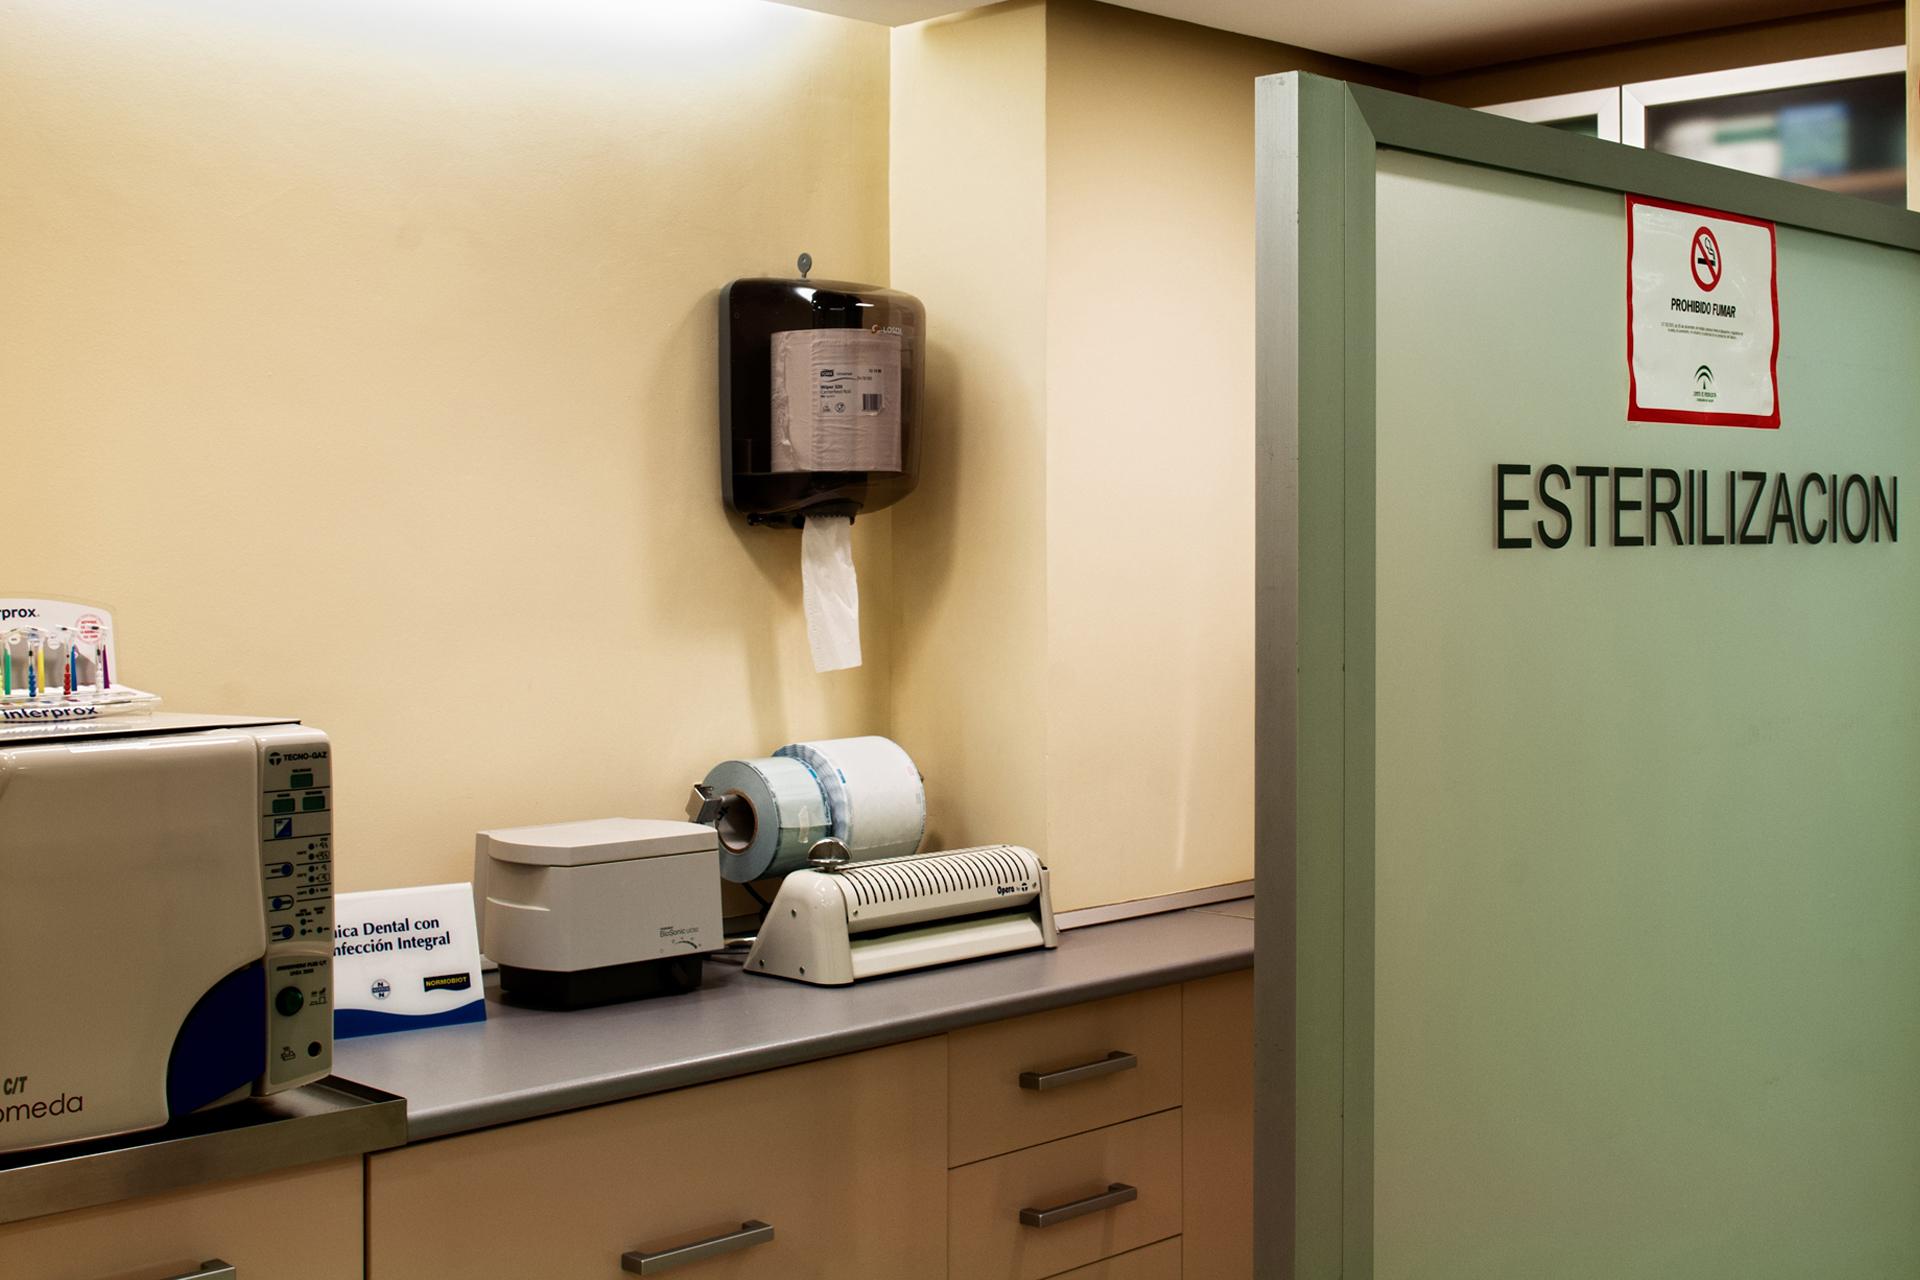 esterilizacion-de-materiales